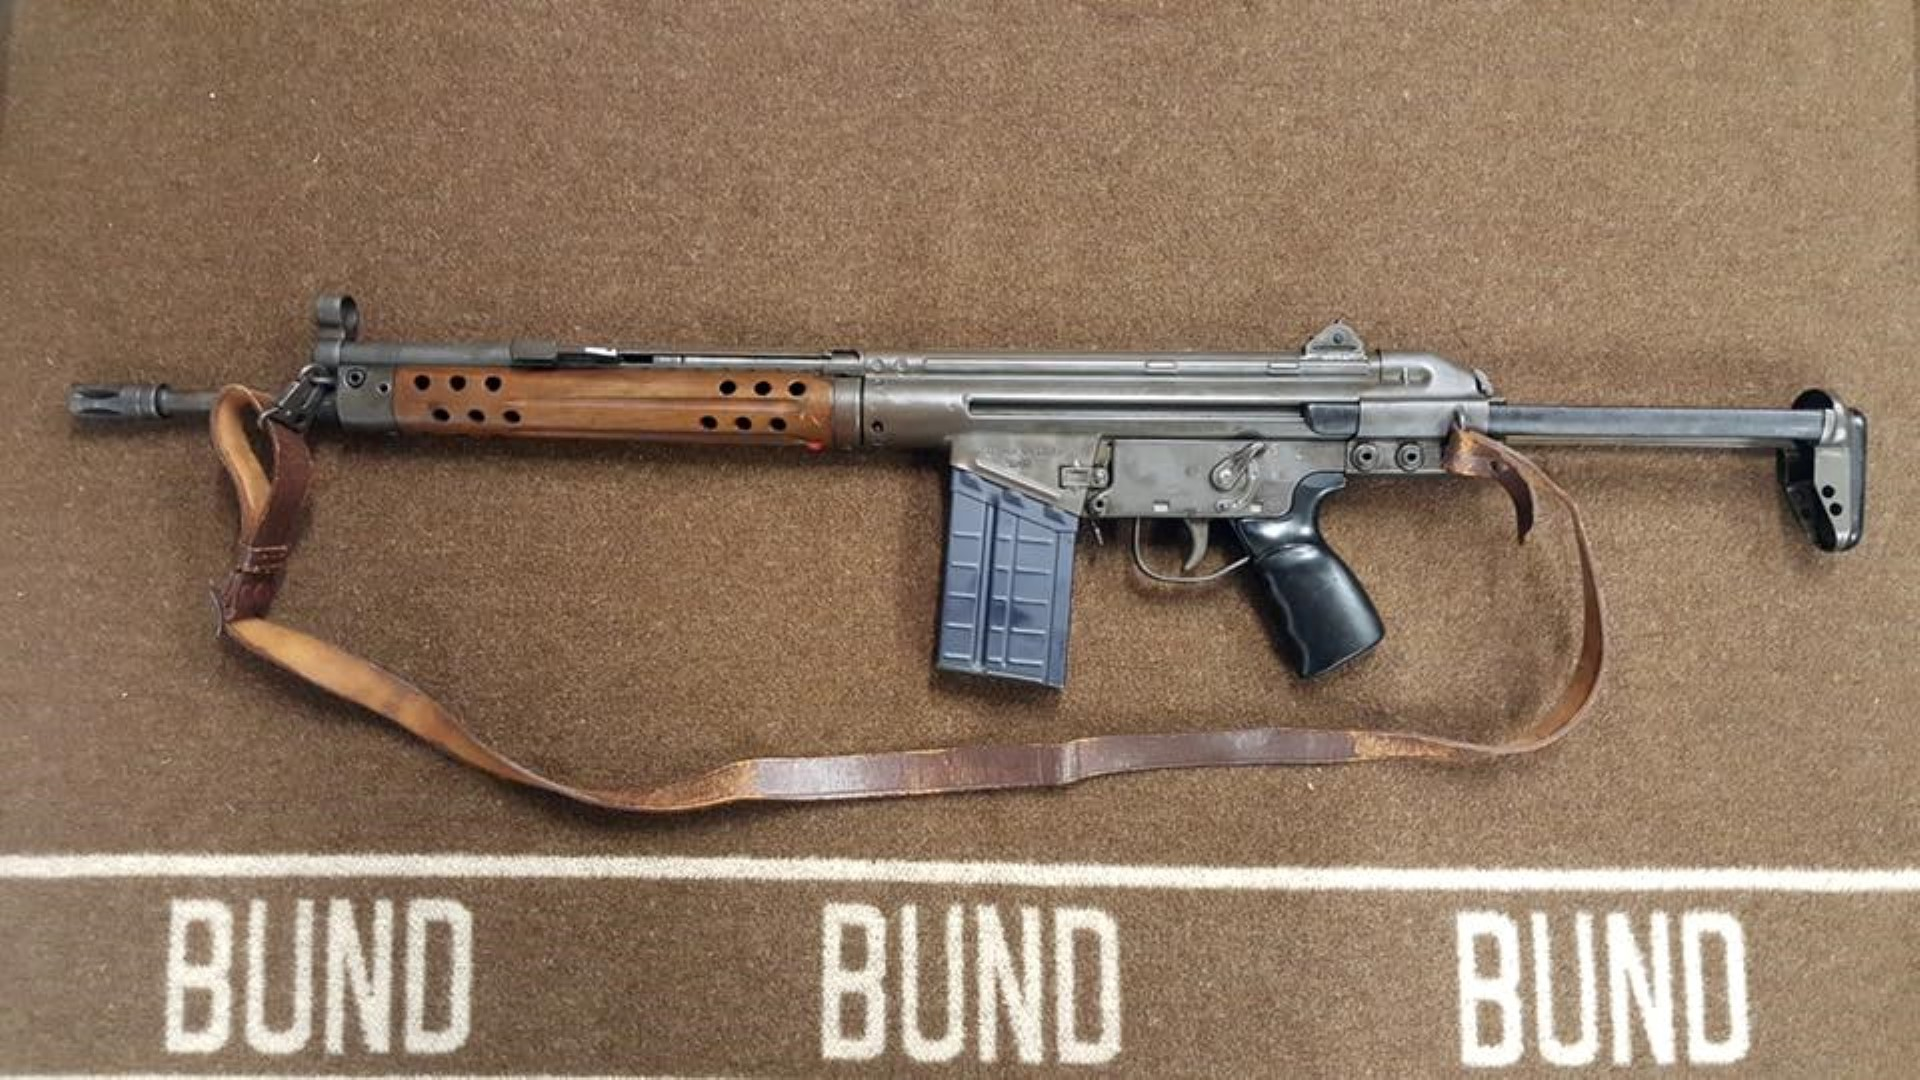 84937d1484286030-1960-hk-g3-rifle-153807